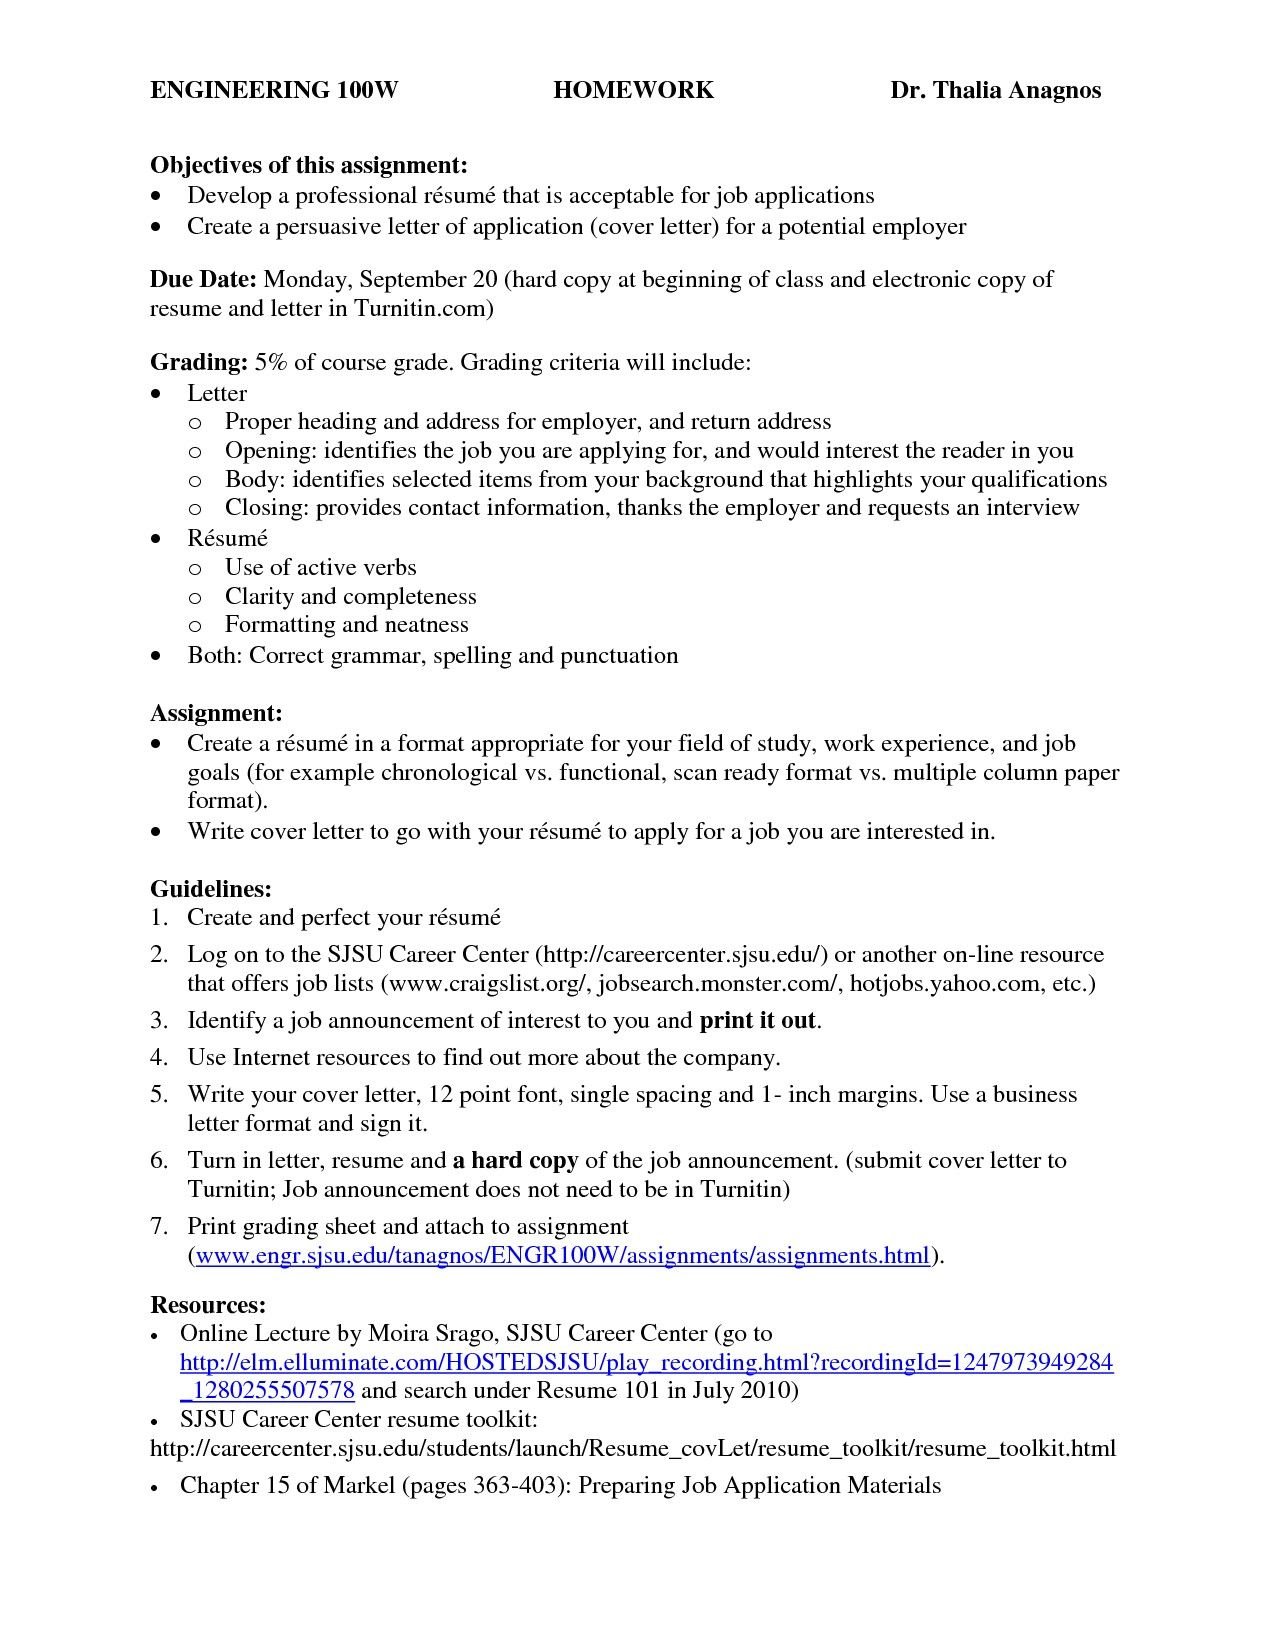 Resume Format Purdue Owl Resume Format Resume Format Persuasive Letter Cv Format